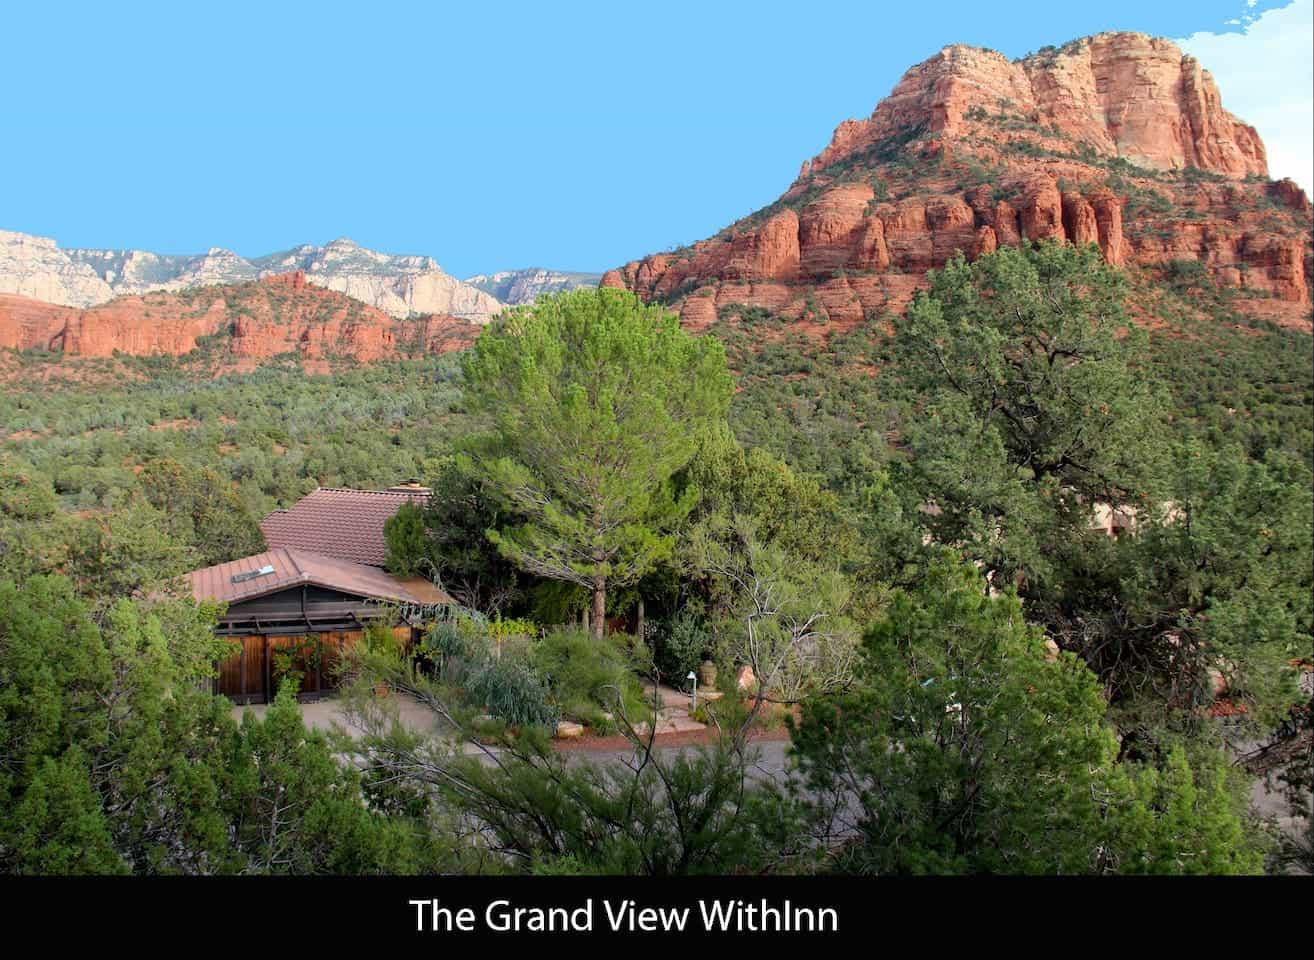 Image of Airbnb rental in Sedona Arizona